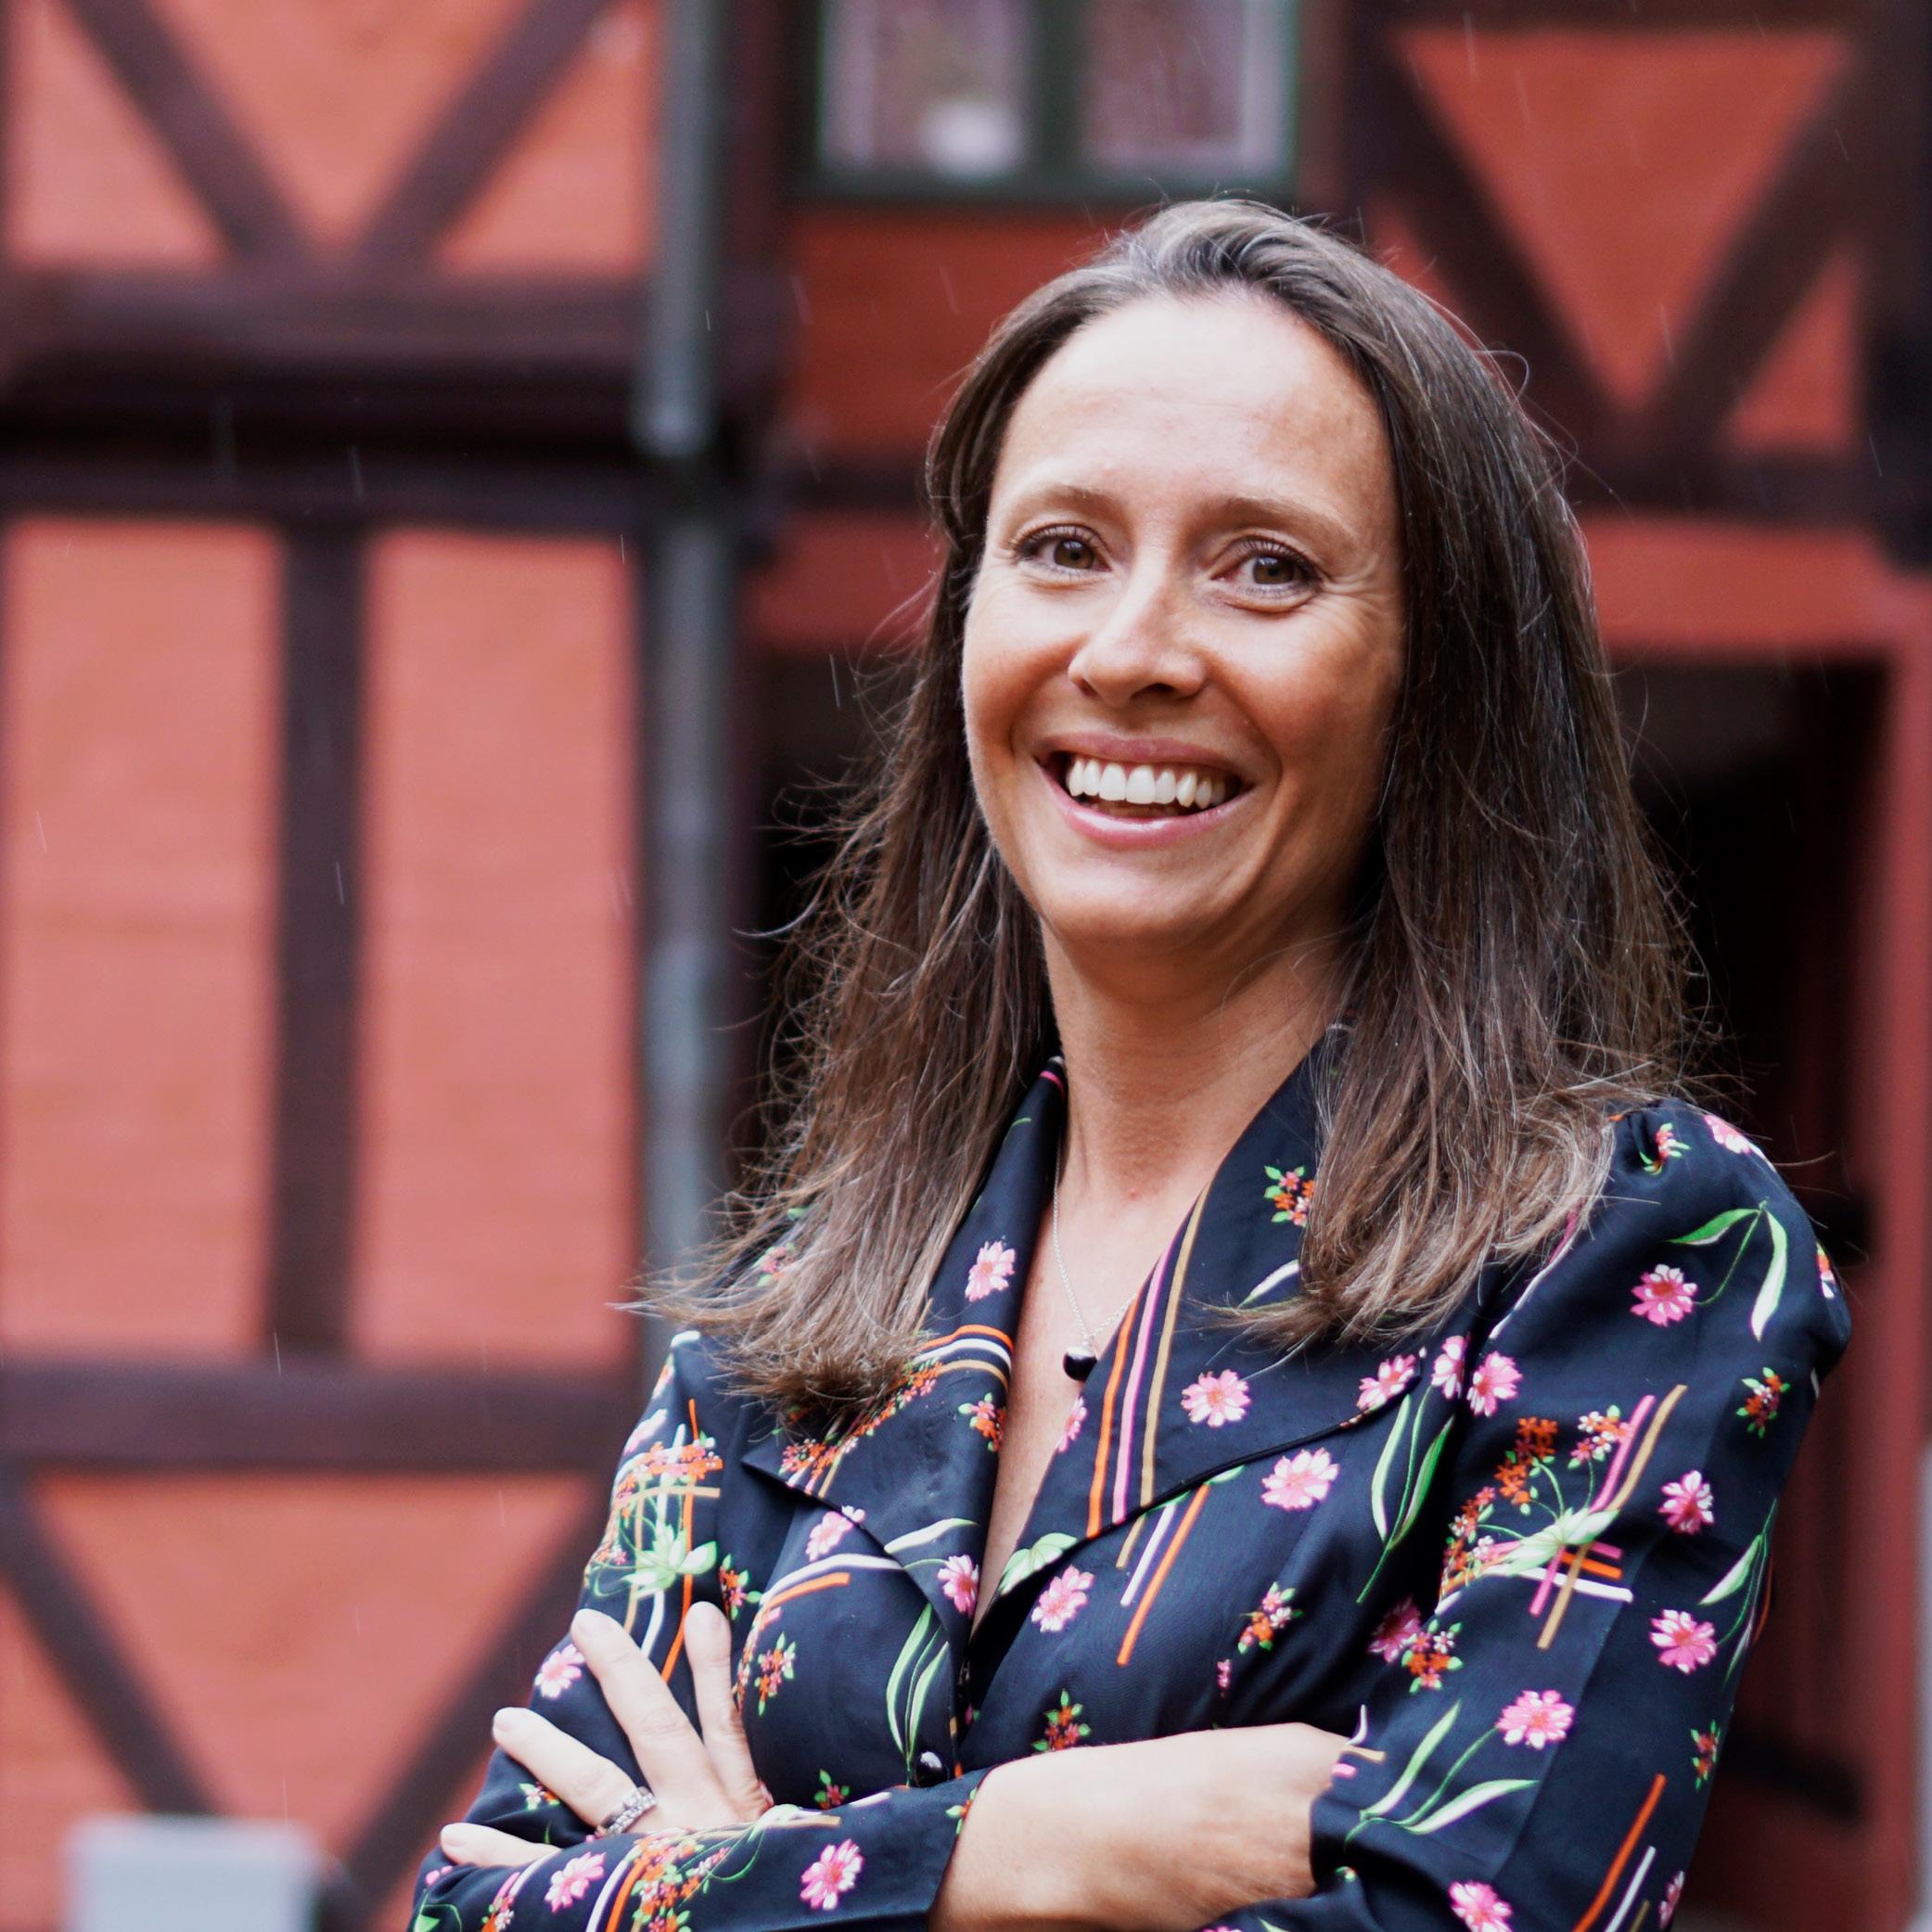 Johanna Søger